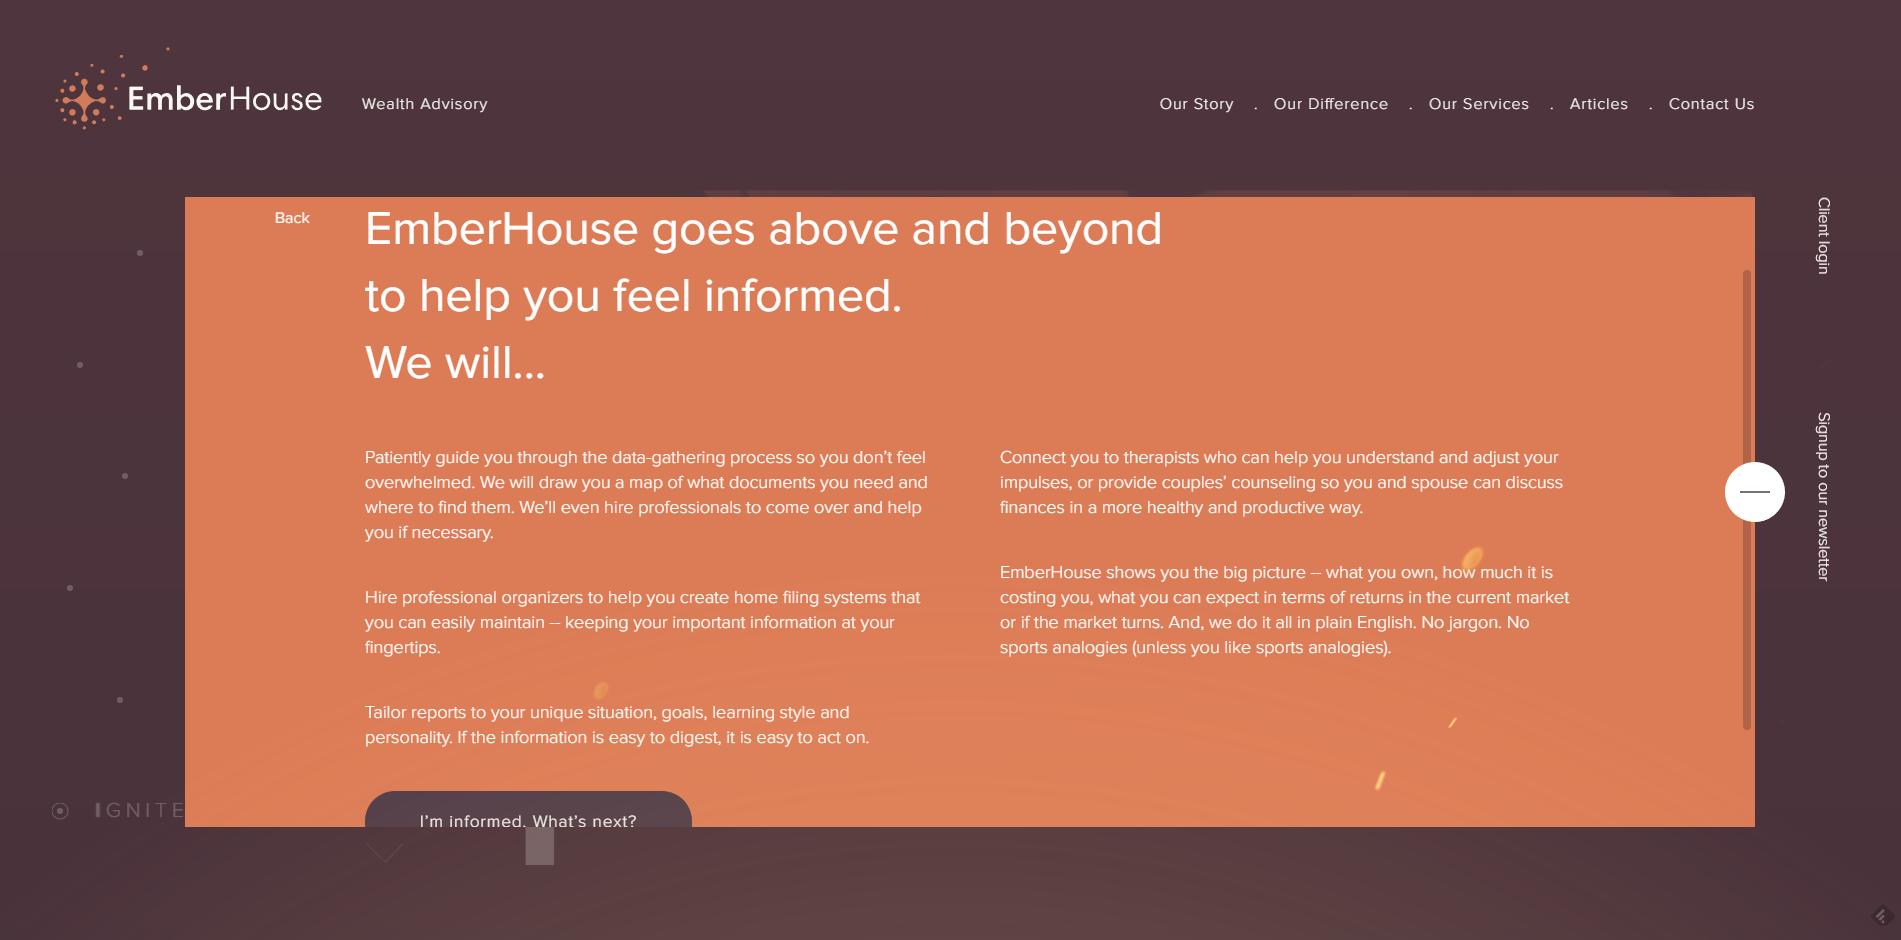 EmberHouse Wealth Advisory